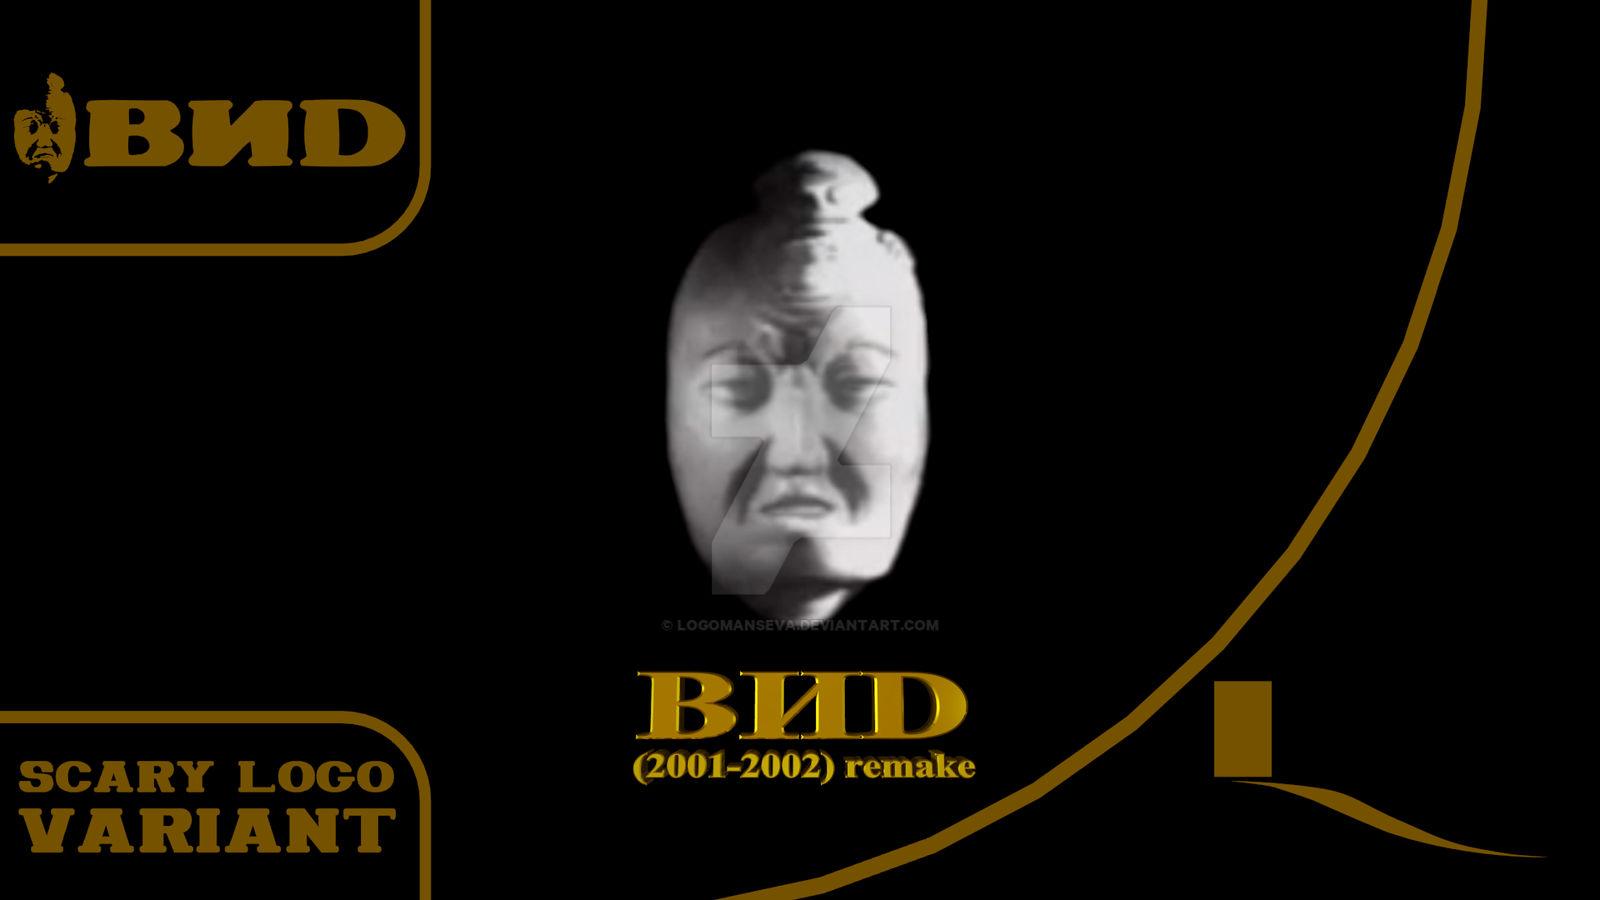 VID logo (2001-2002) remake